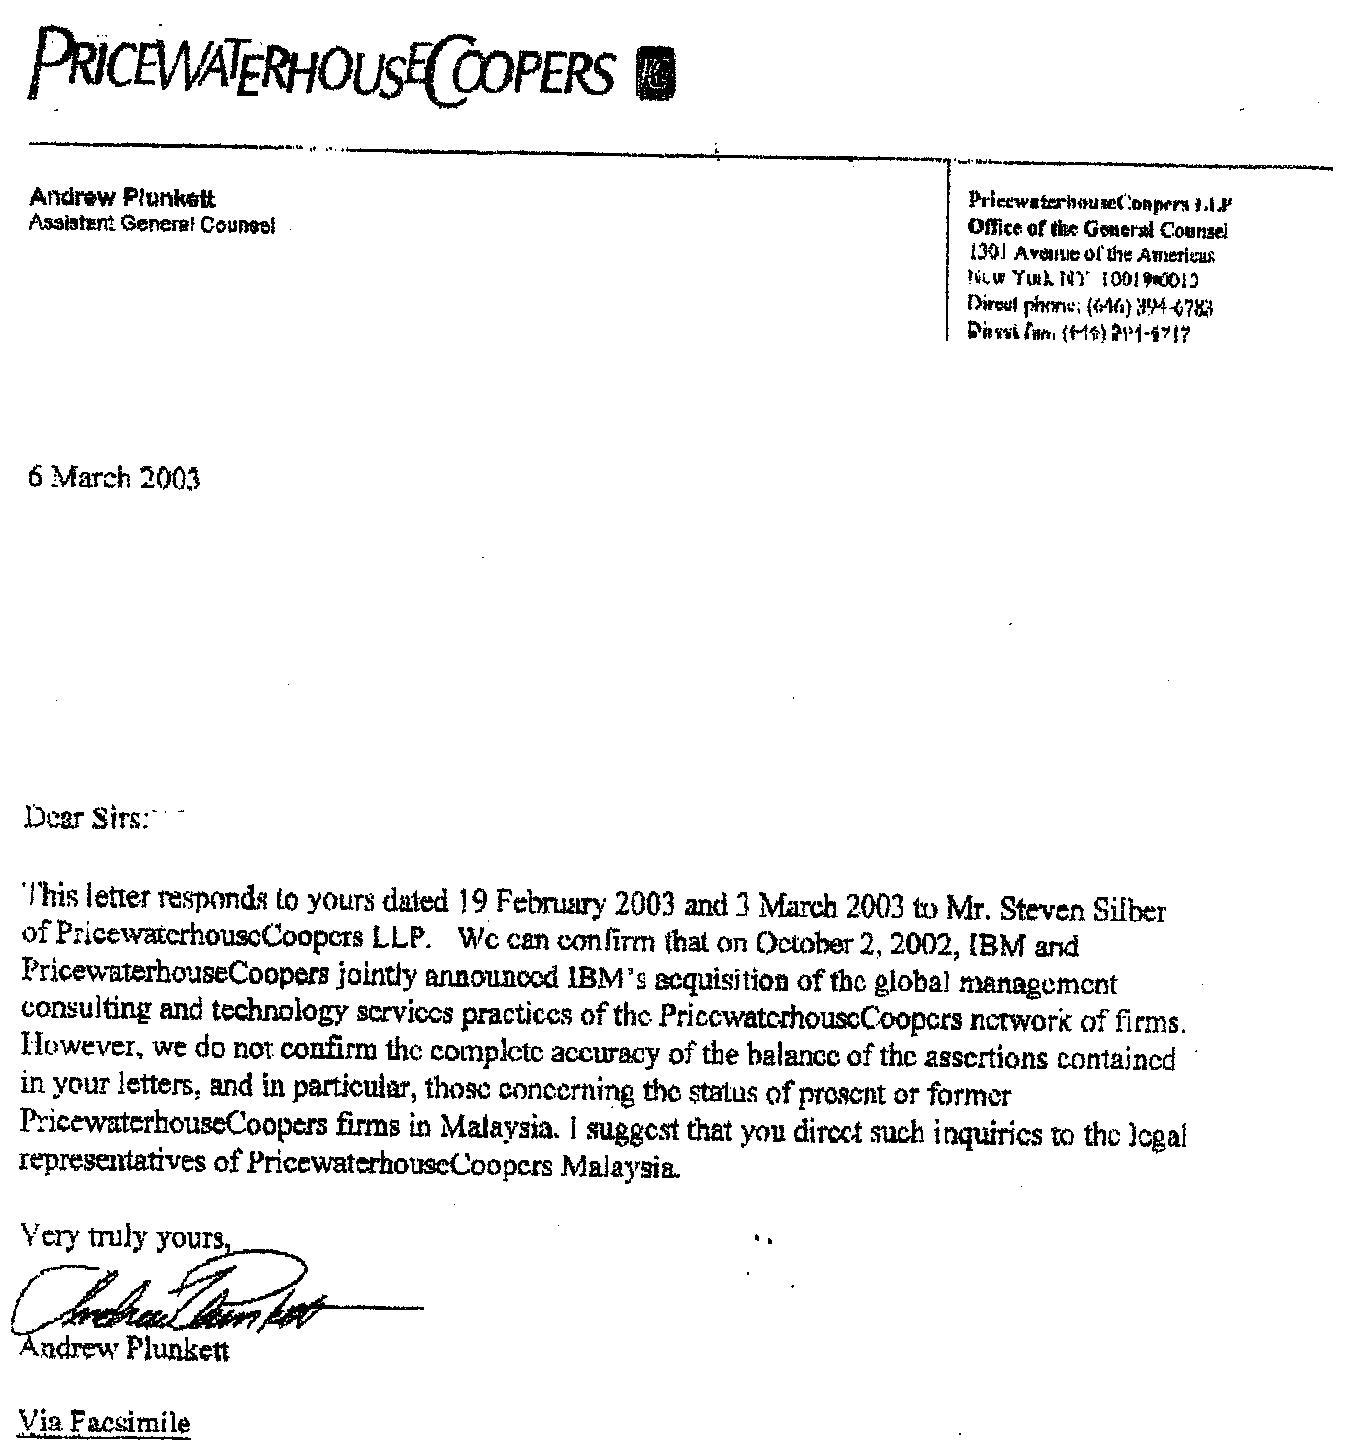 Zarinahtakesapaycut: PricewaterhouseCoopers LLP, Owners Of